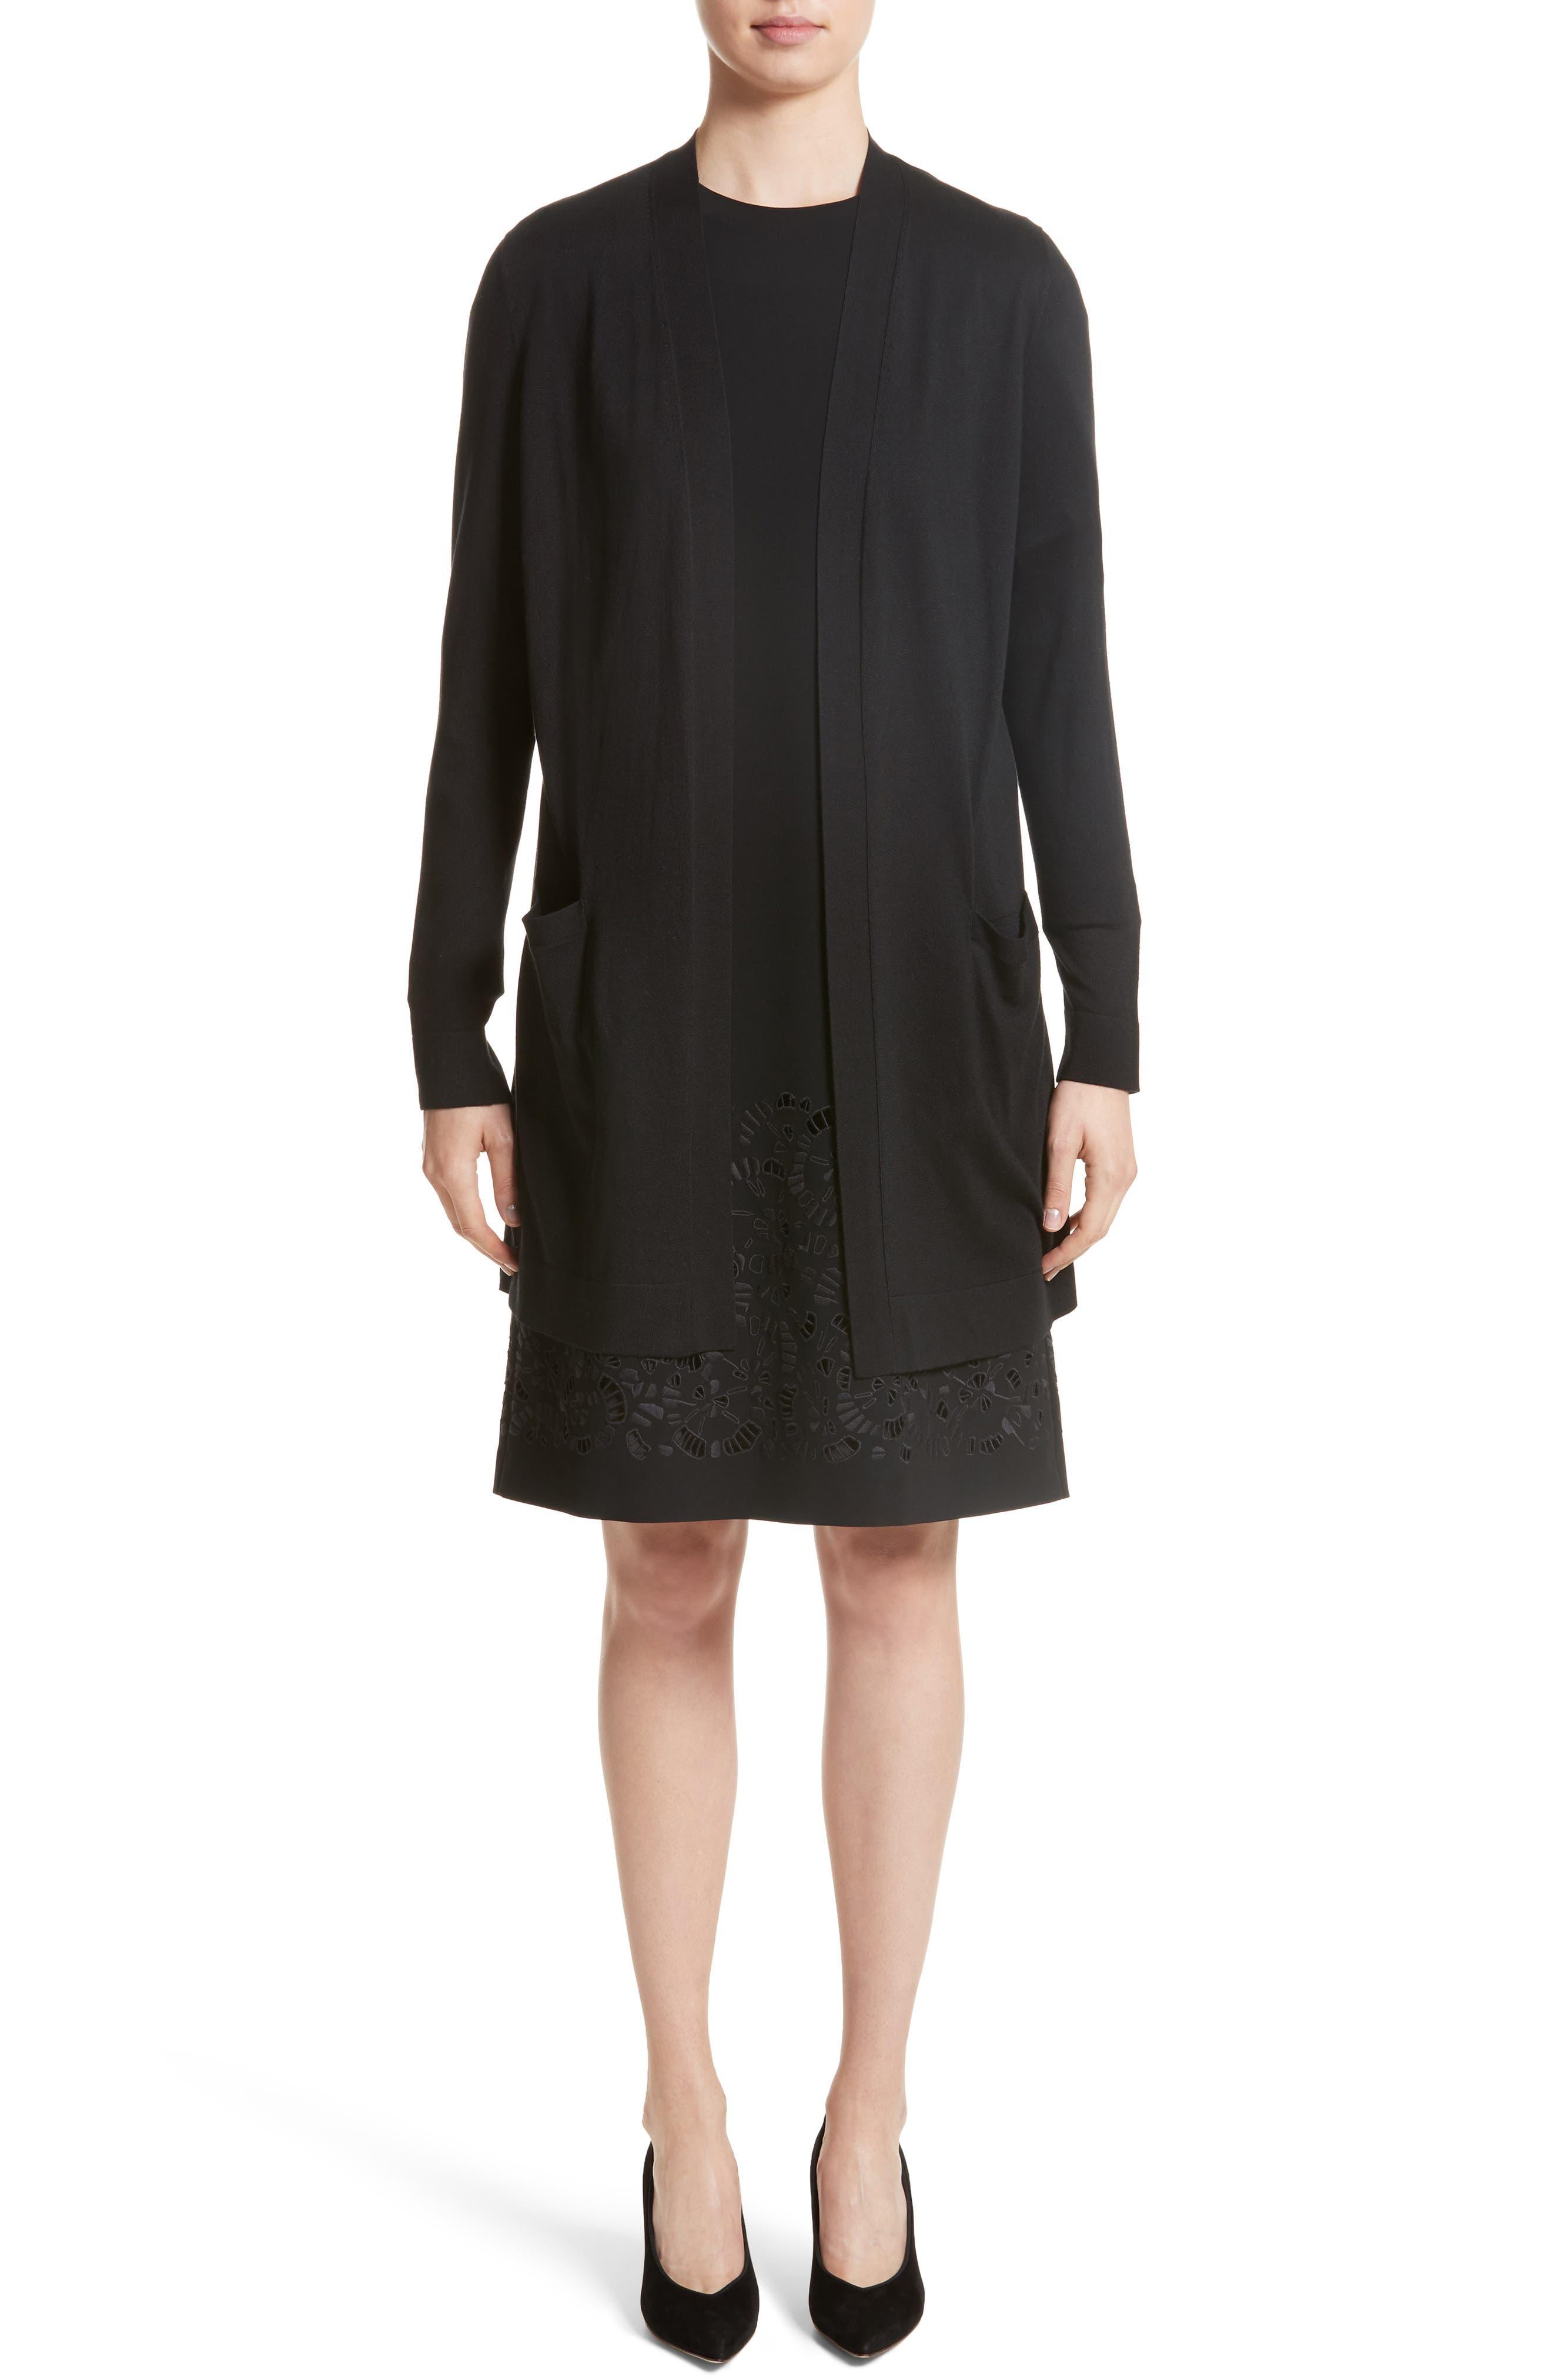 Corbin Embroidered Laser Cut Dress,                             Alternate thumbnail 8, color,                             Black